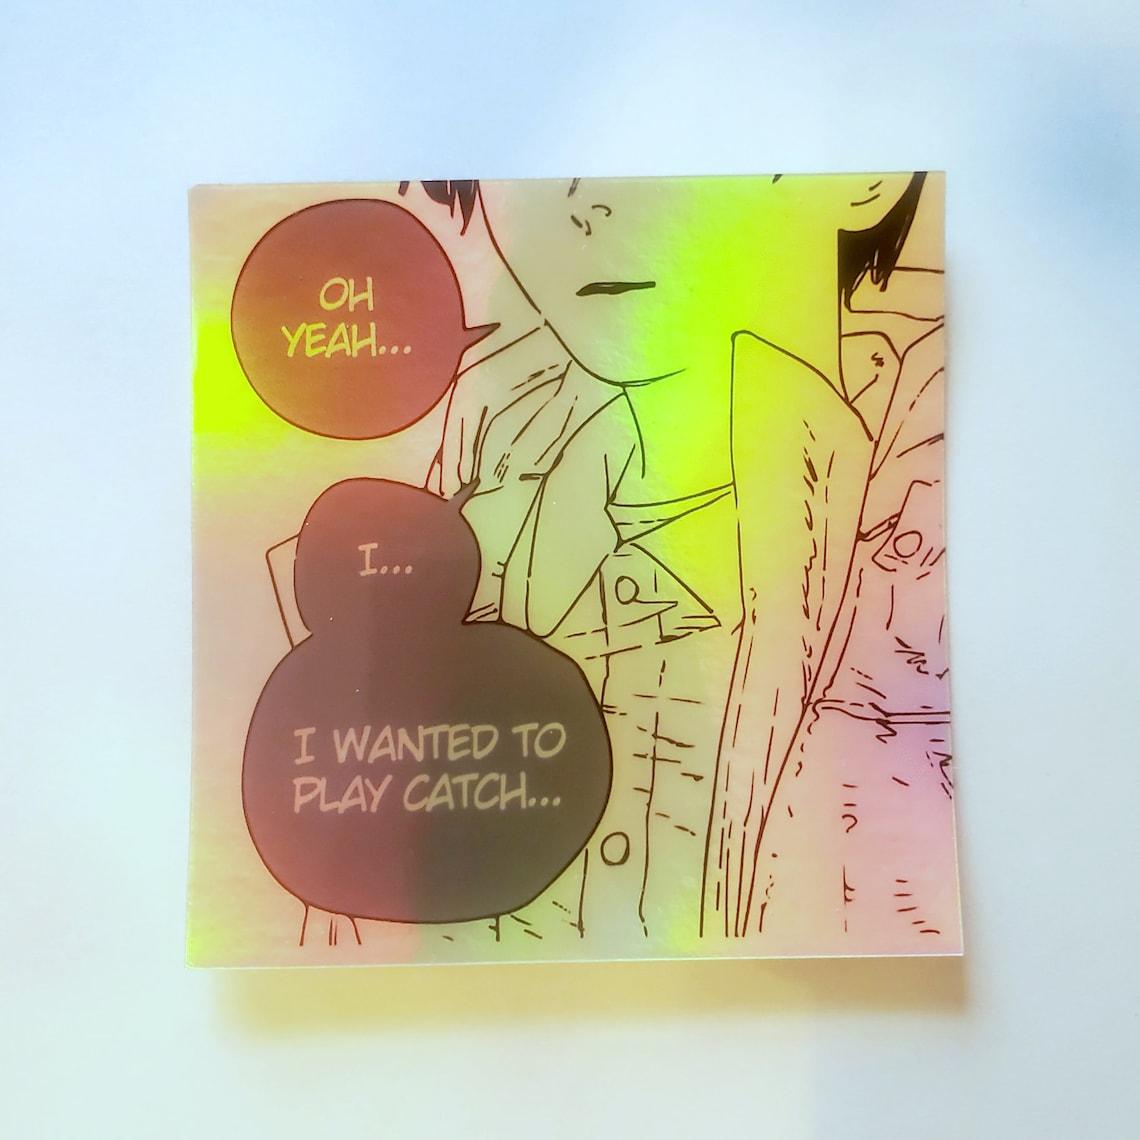 aki hayakawa chainsaw holographic sticker 3in x 3in etsy